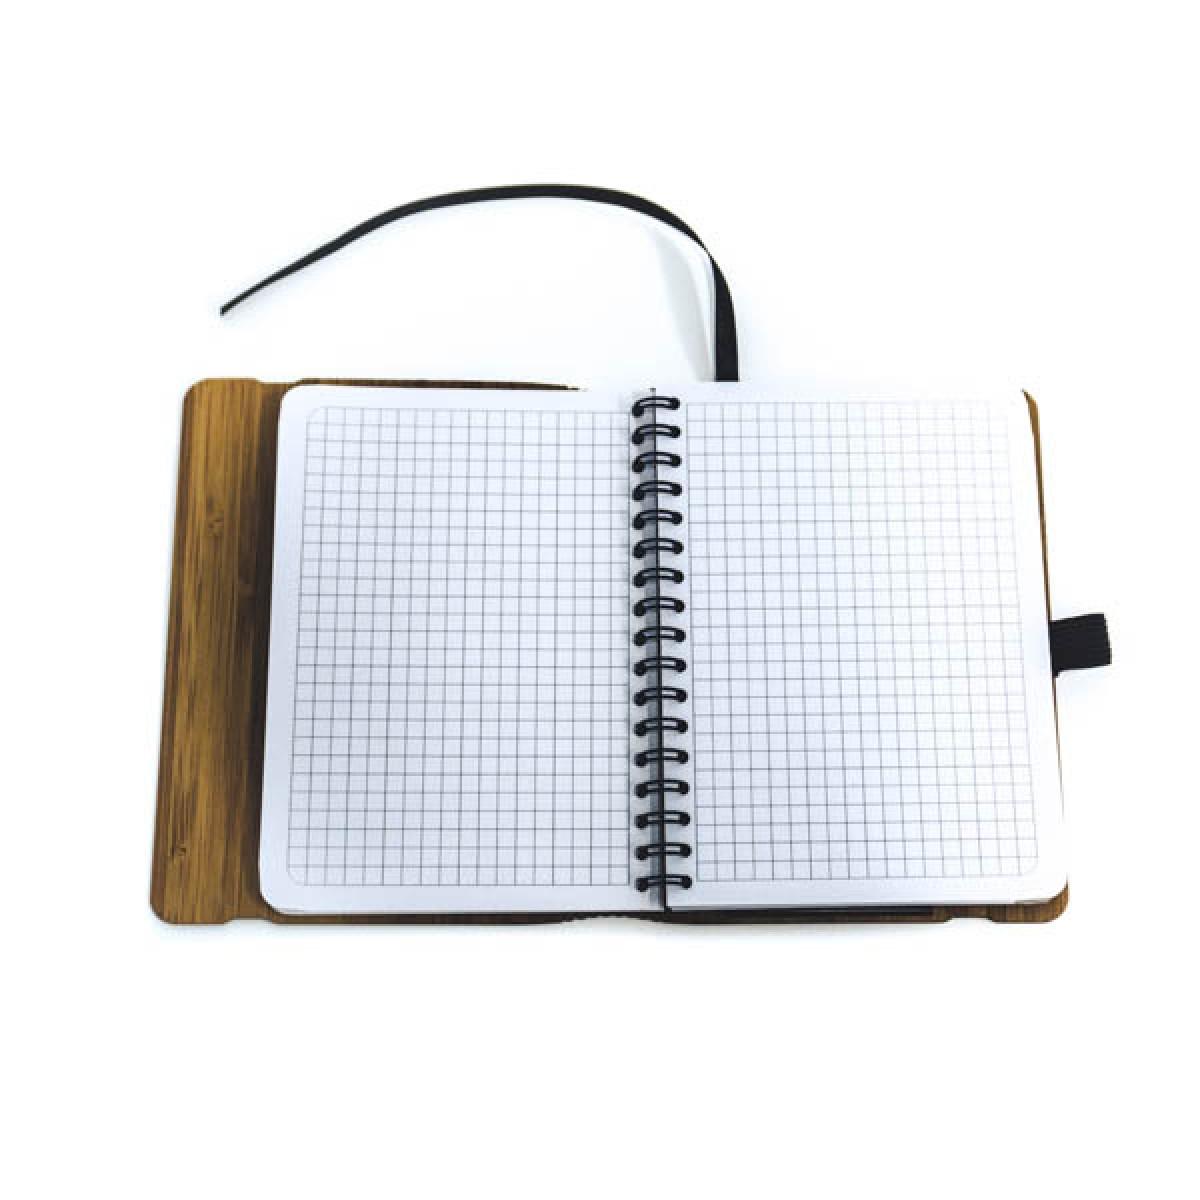 JUNGHOLZ Design Notizbuch, WoodBook, Bambus, A6